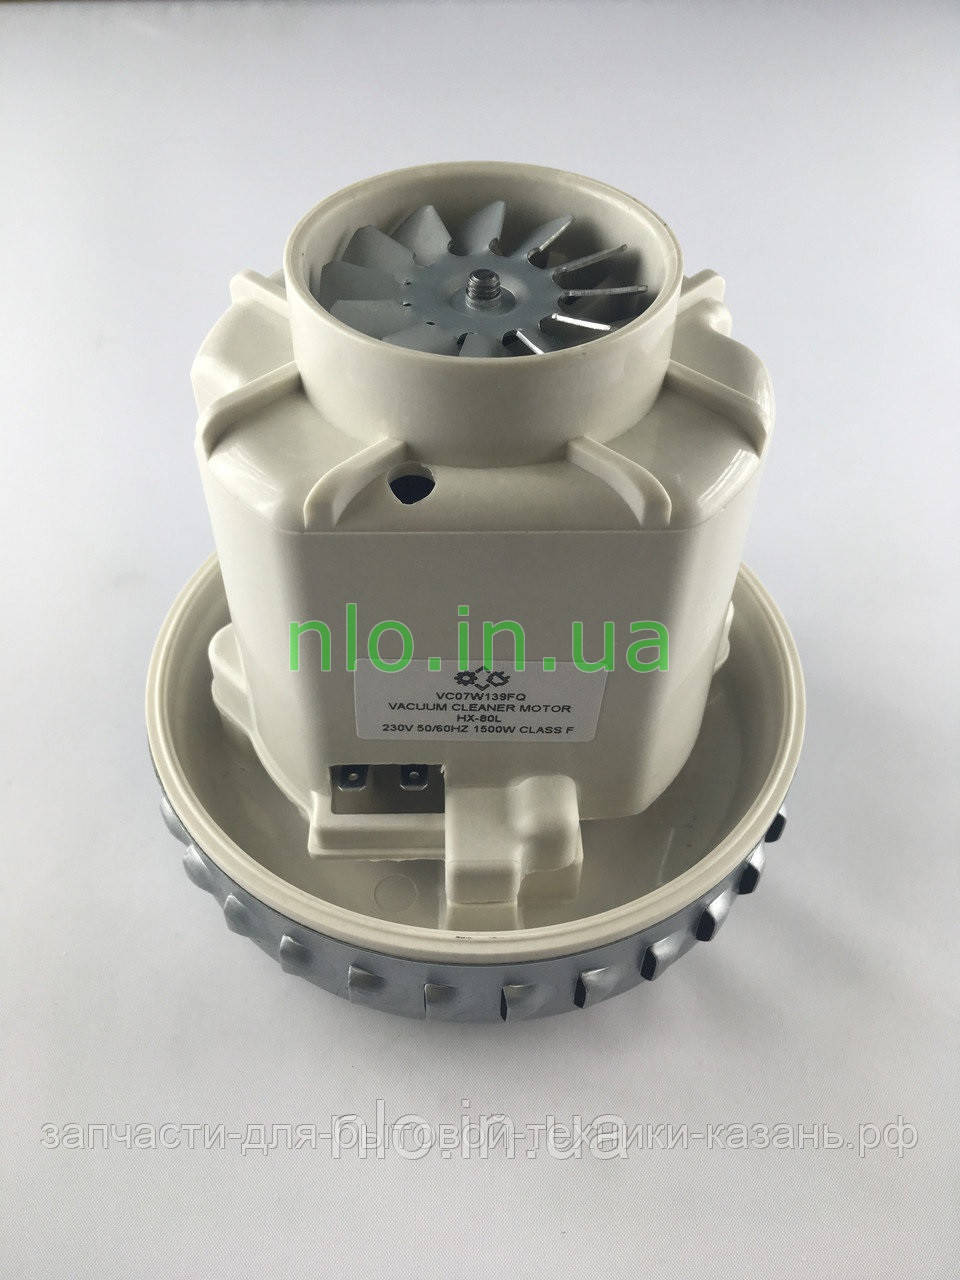 Двигатель пылесоса THOMAS 100368 1600W, VC07W1332CF d=130 h=134